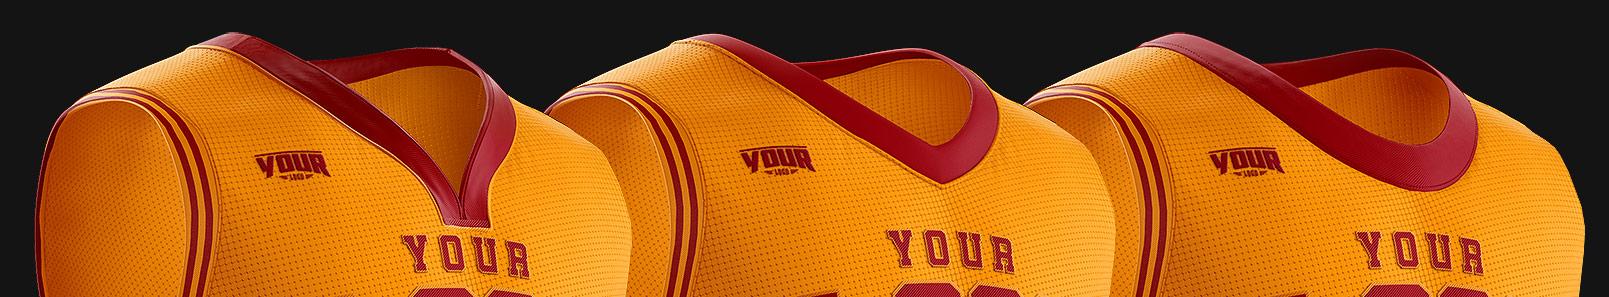 basketball-jersey-collars